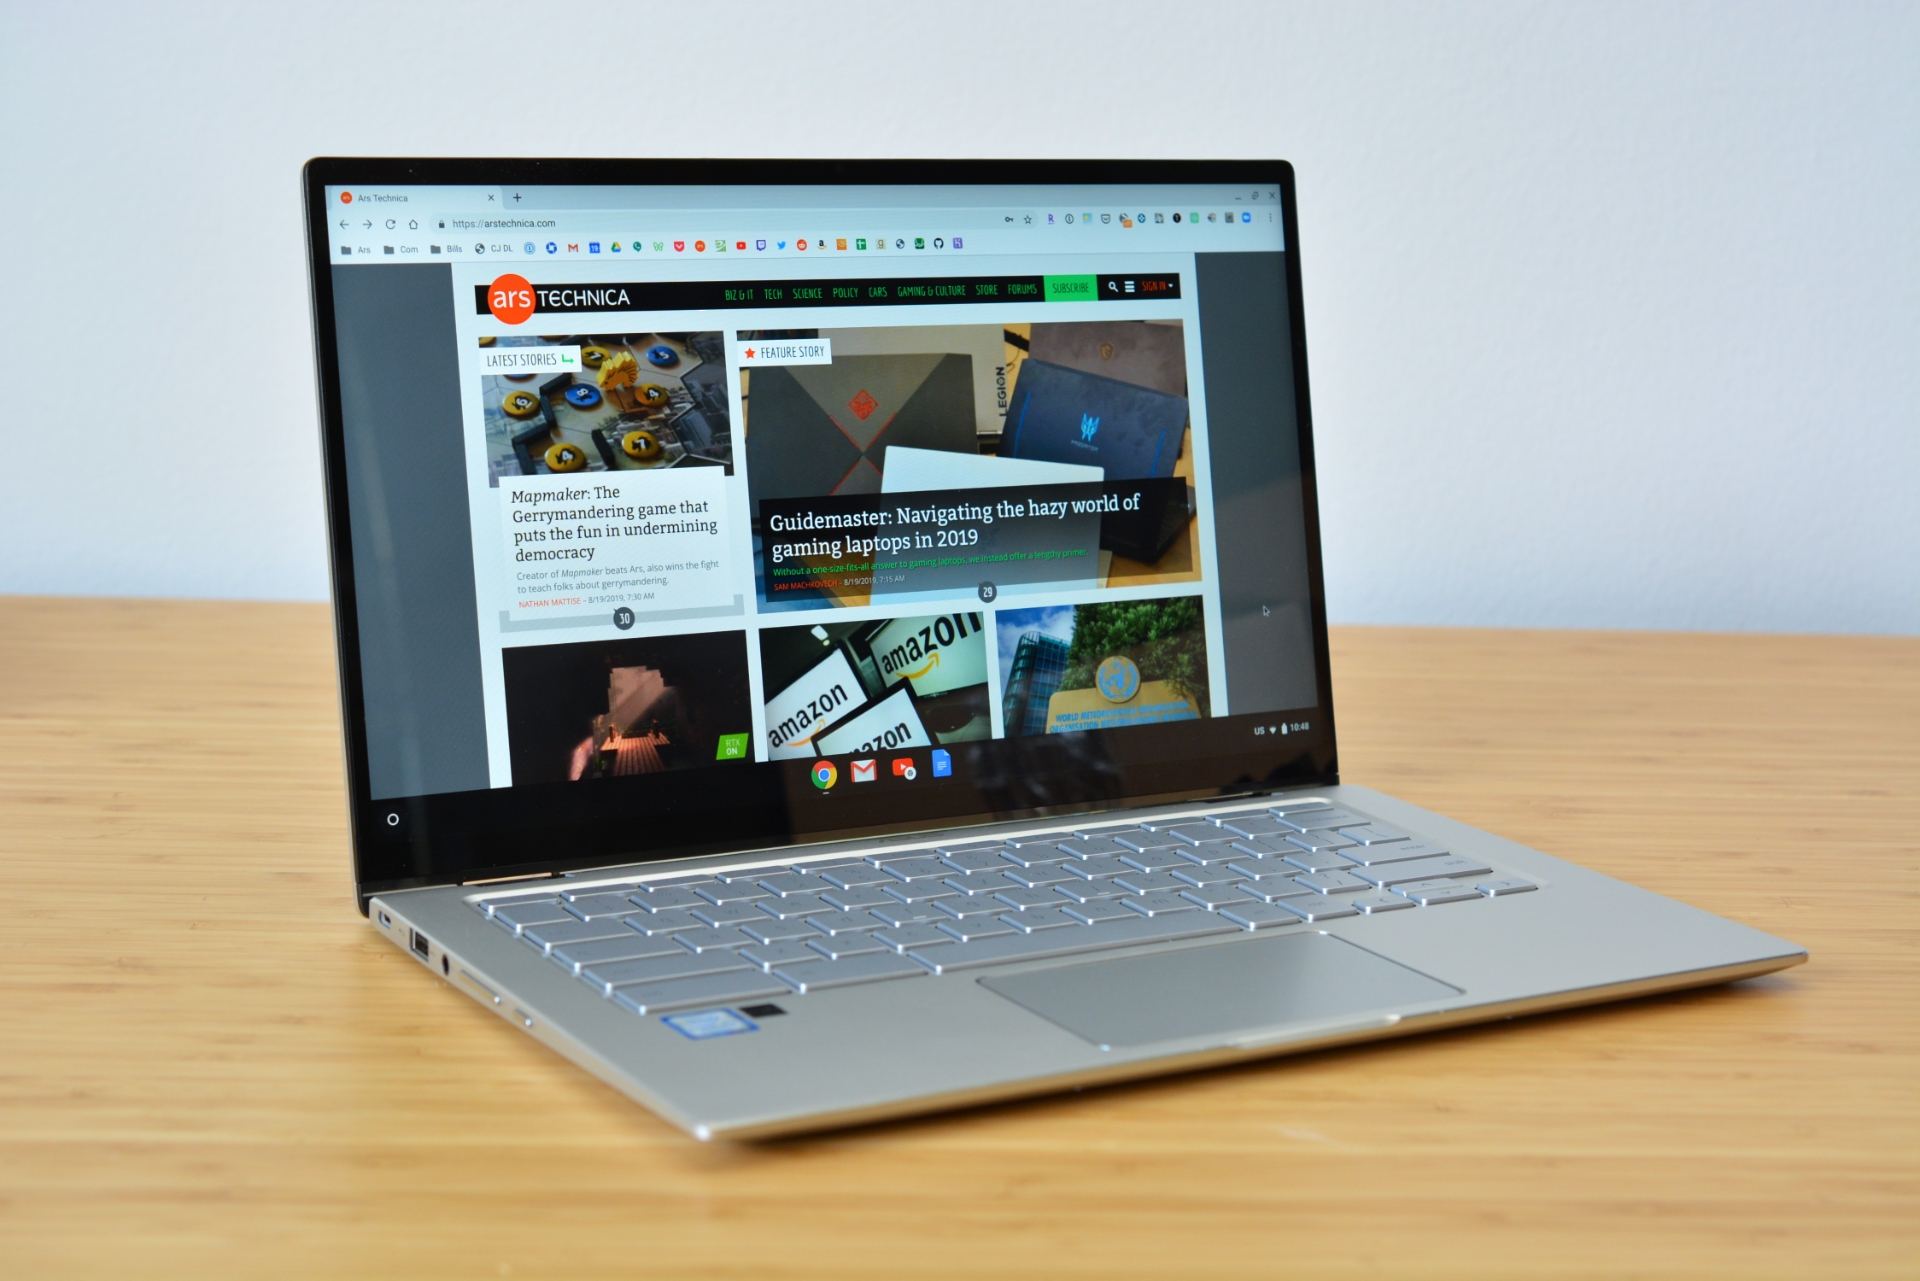 Back to School 2019: 24 best laptops, tablets, headphones